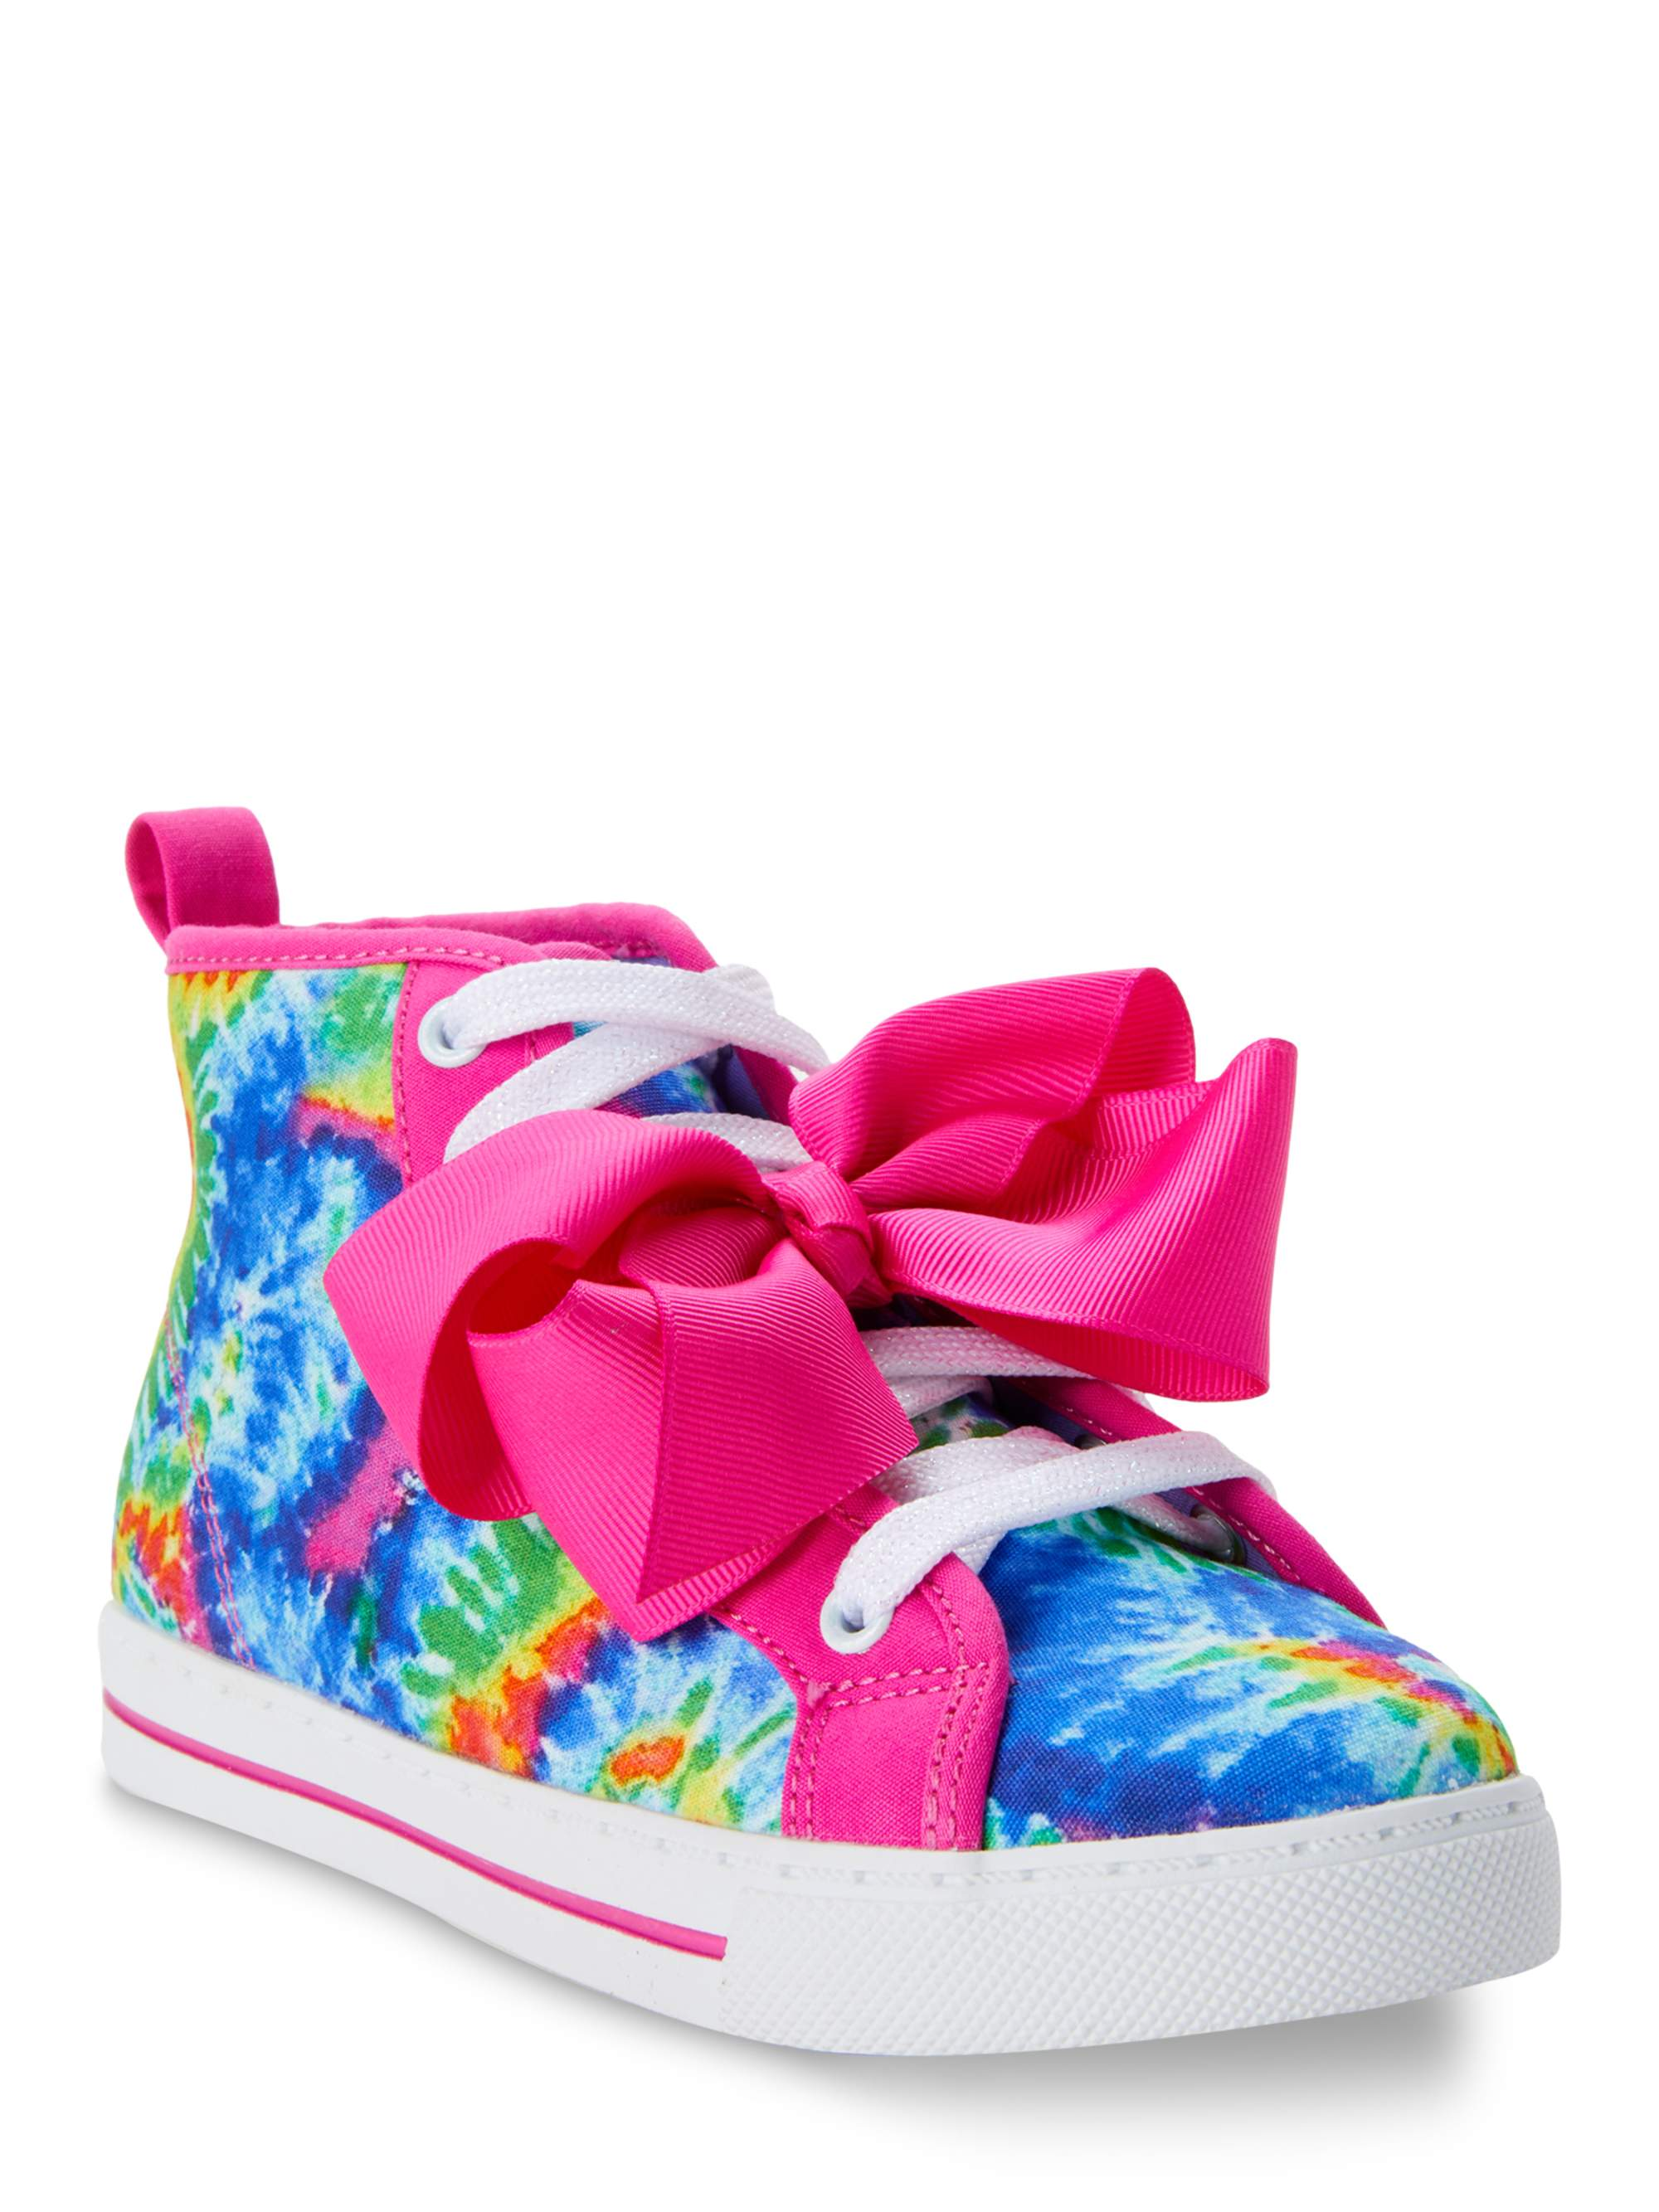 Nickelodeon Jojo Siwa Tie-Dye High-Top